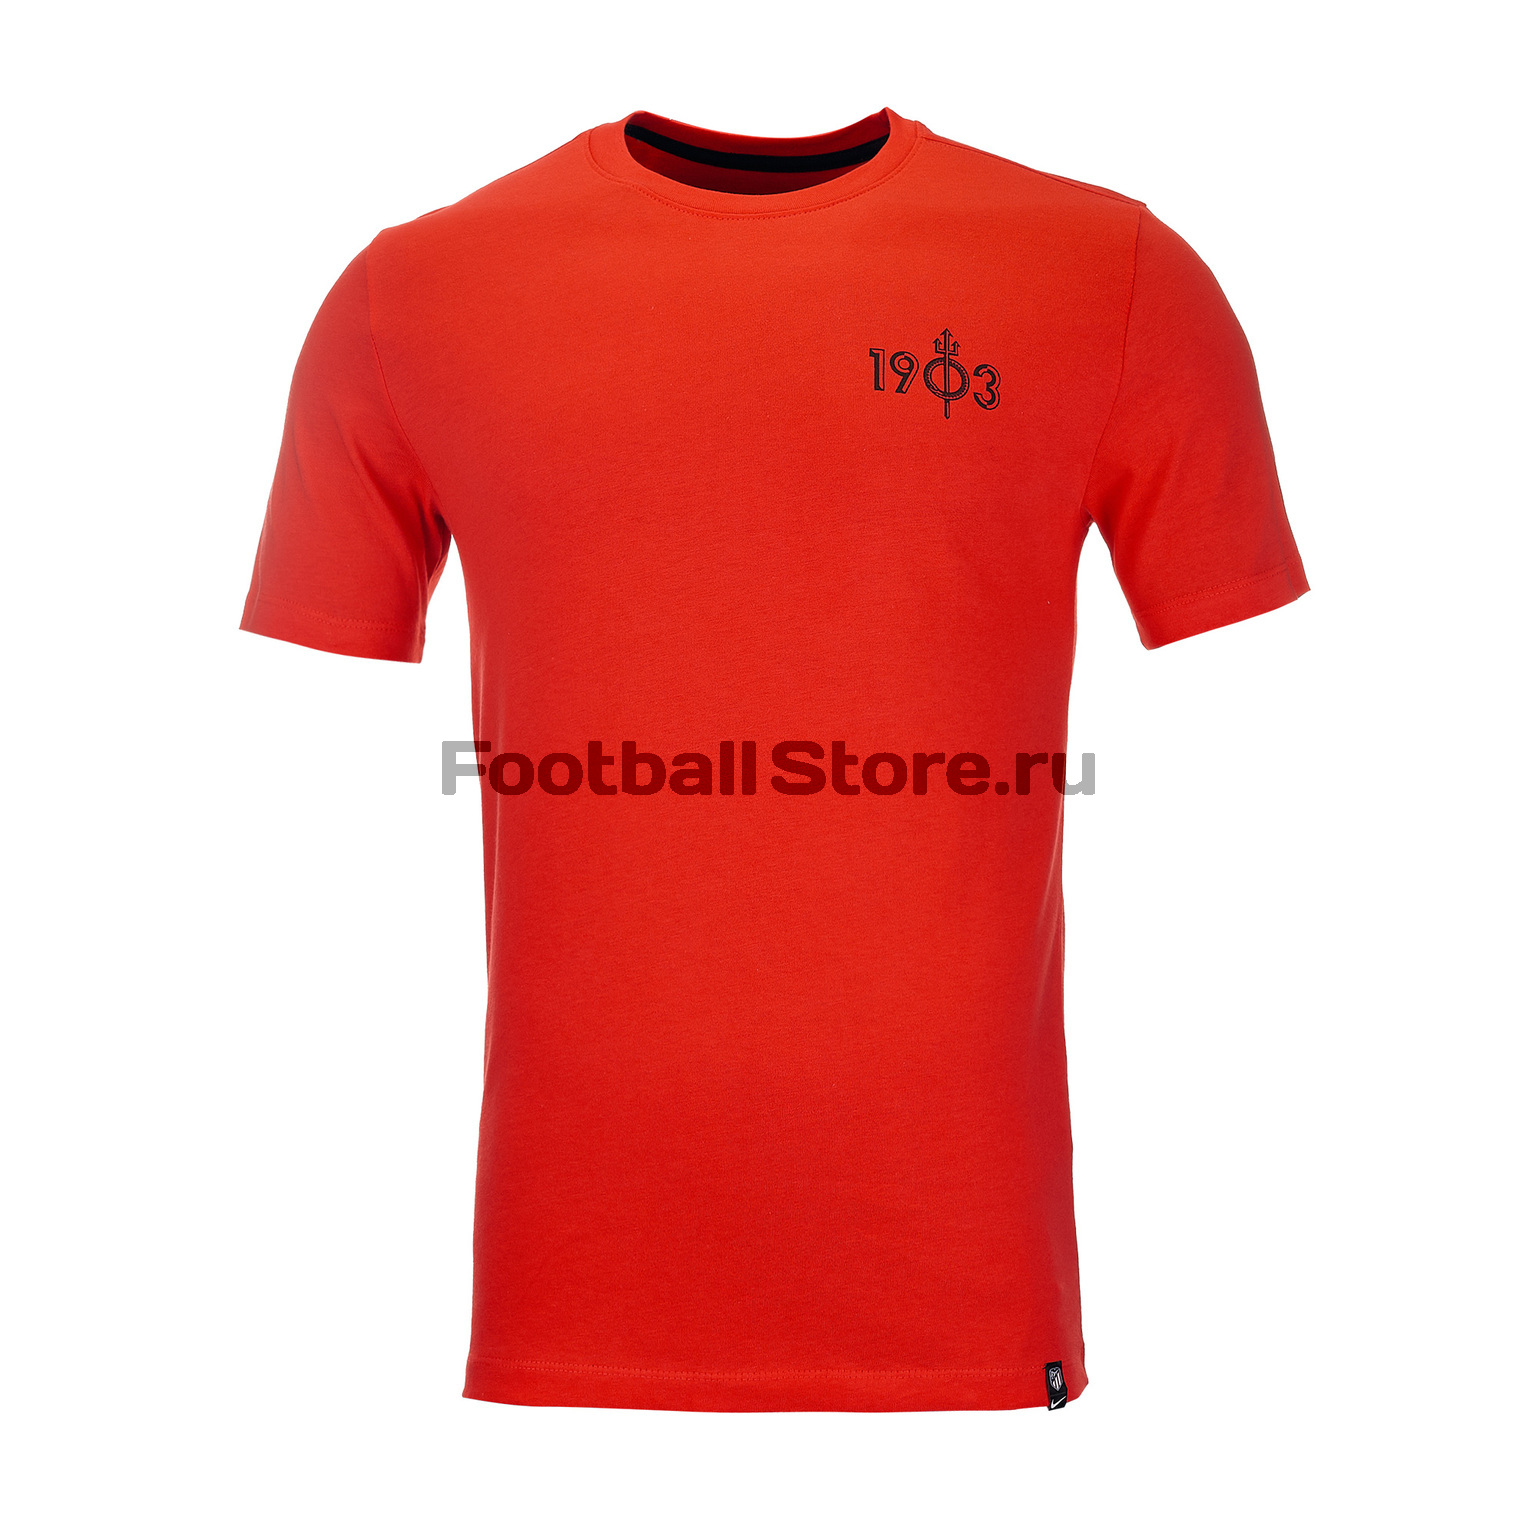 цена на Футболка хлопковая Nike Atletico Madrid AQ7518-600